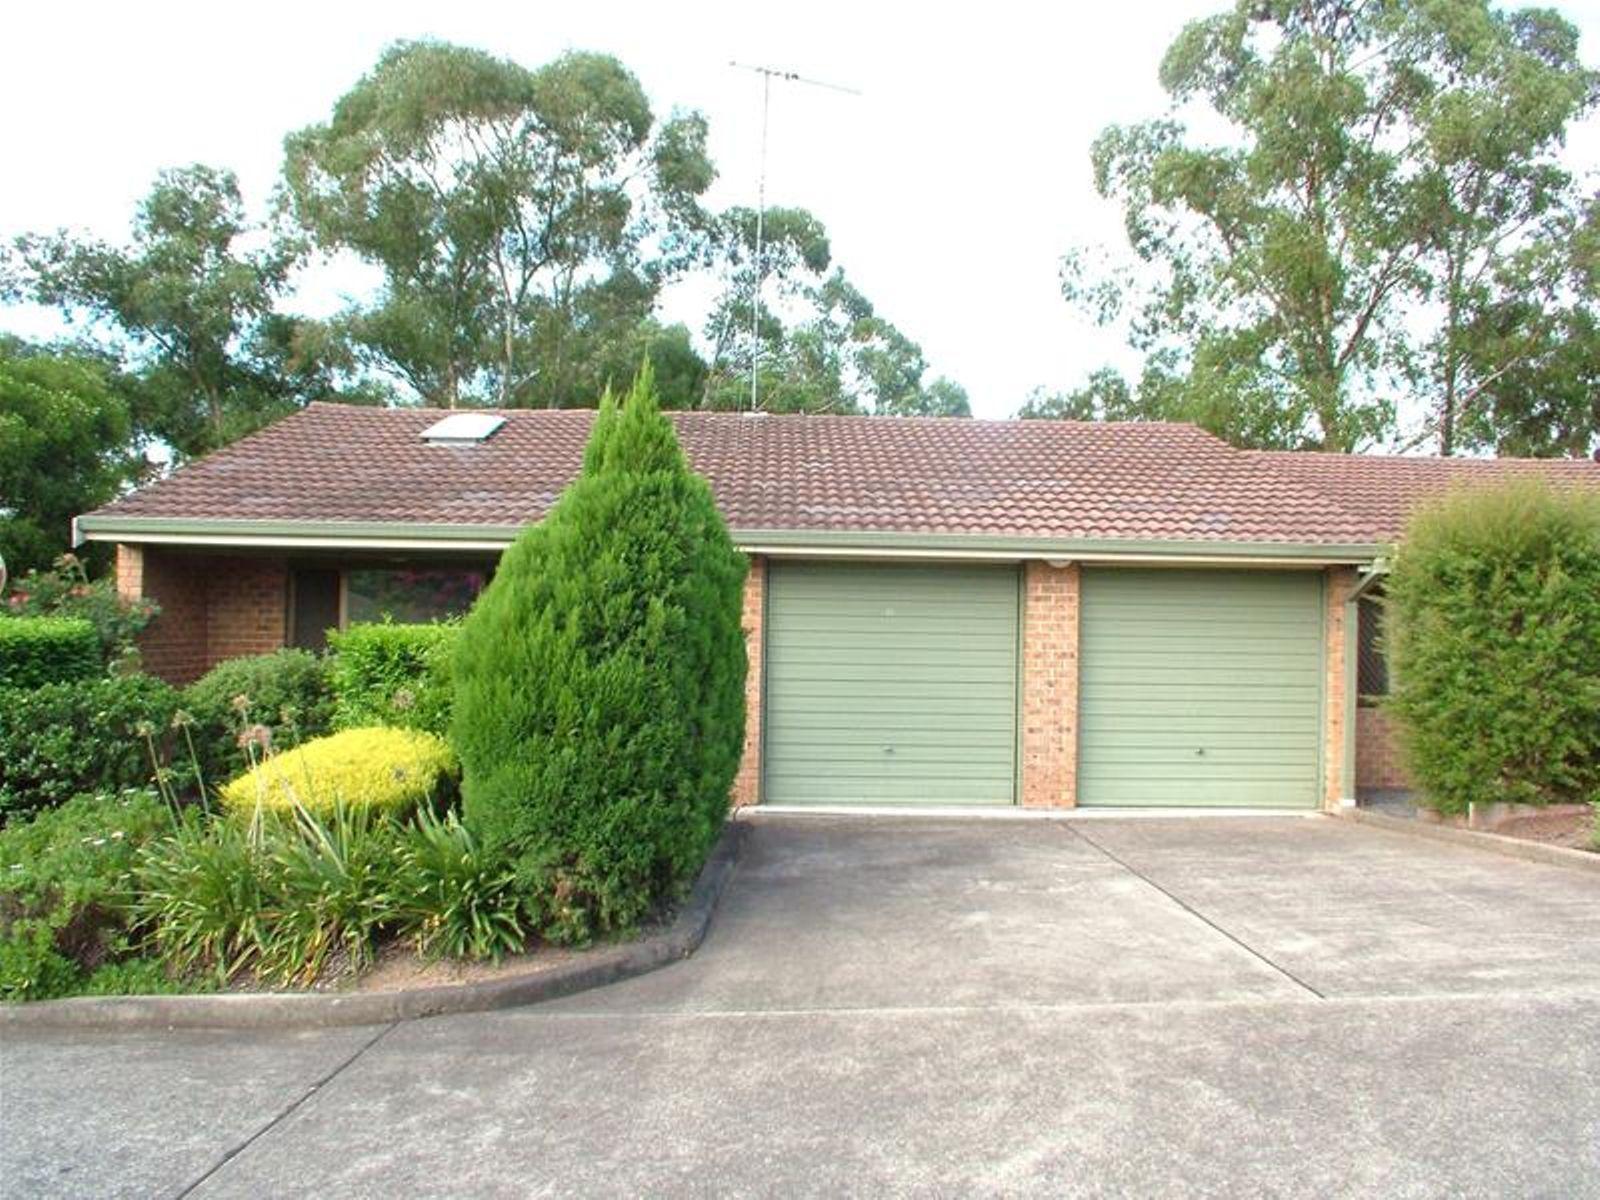 21/7 Chapel Lane, Baulkham Hills, NSW 2153